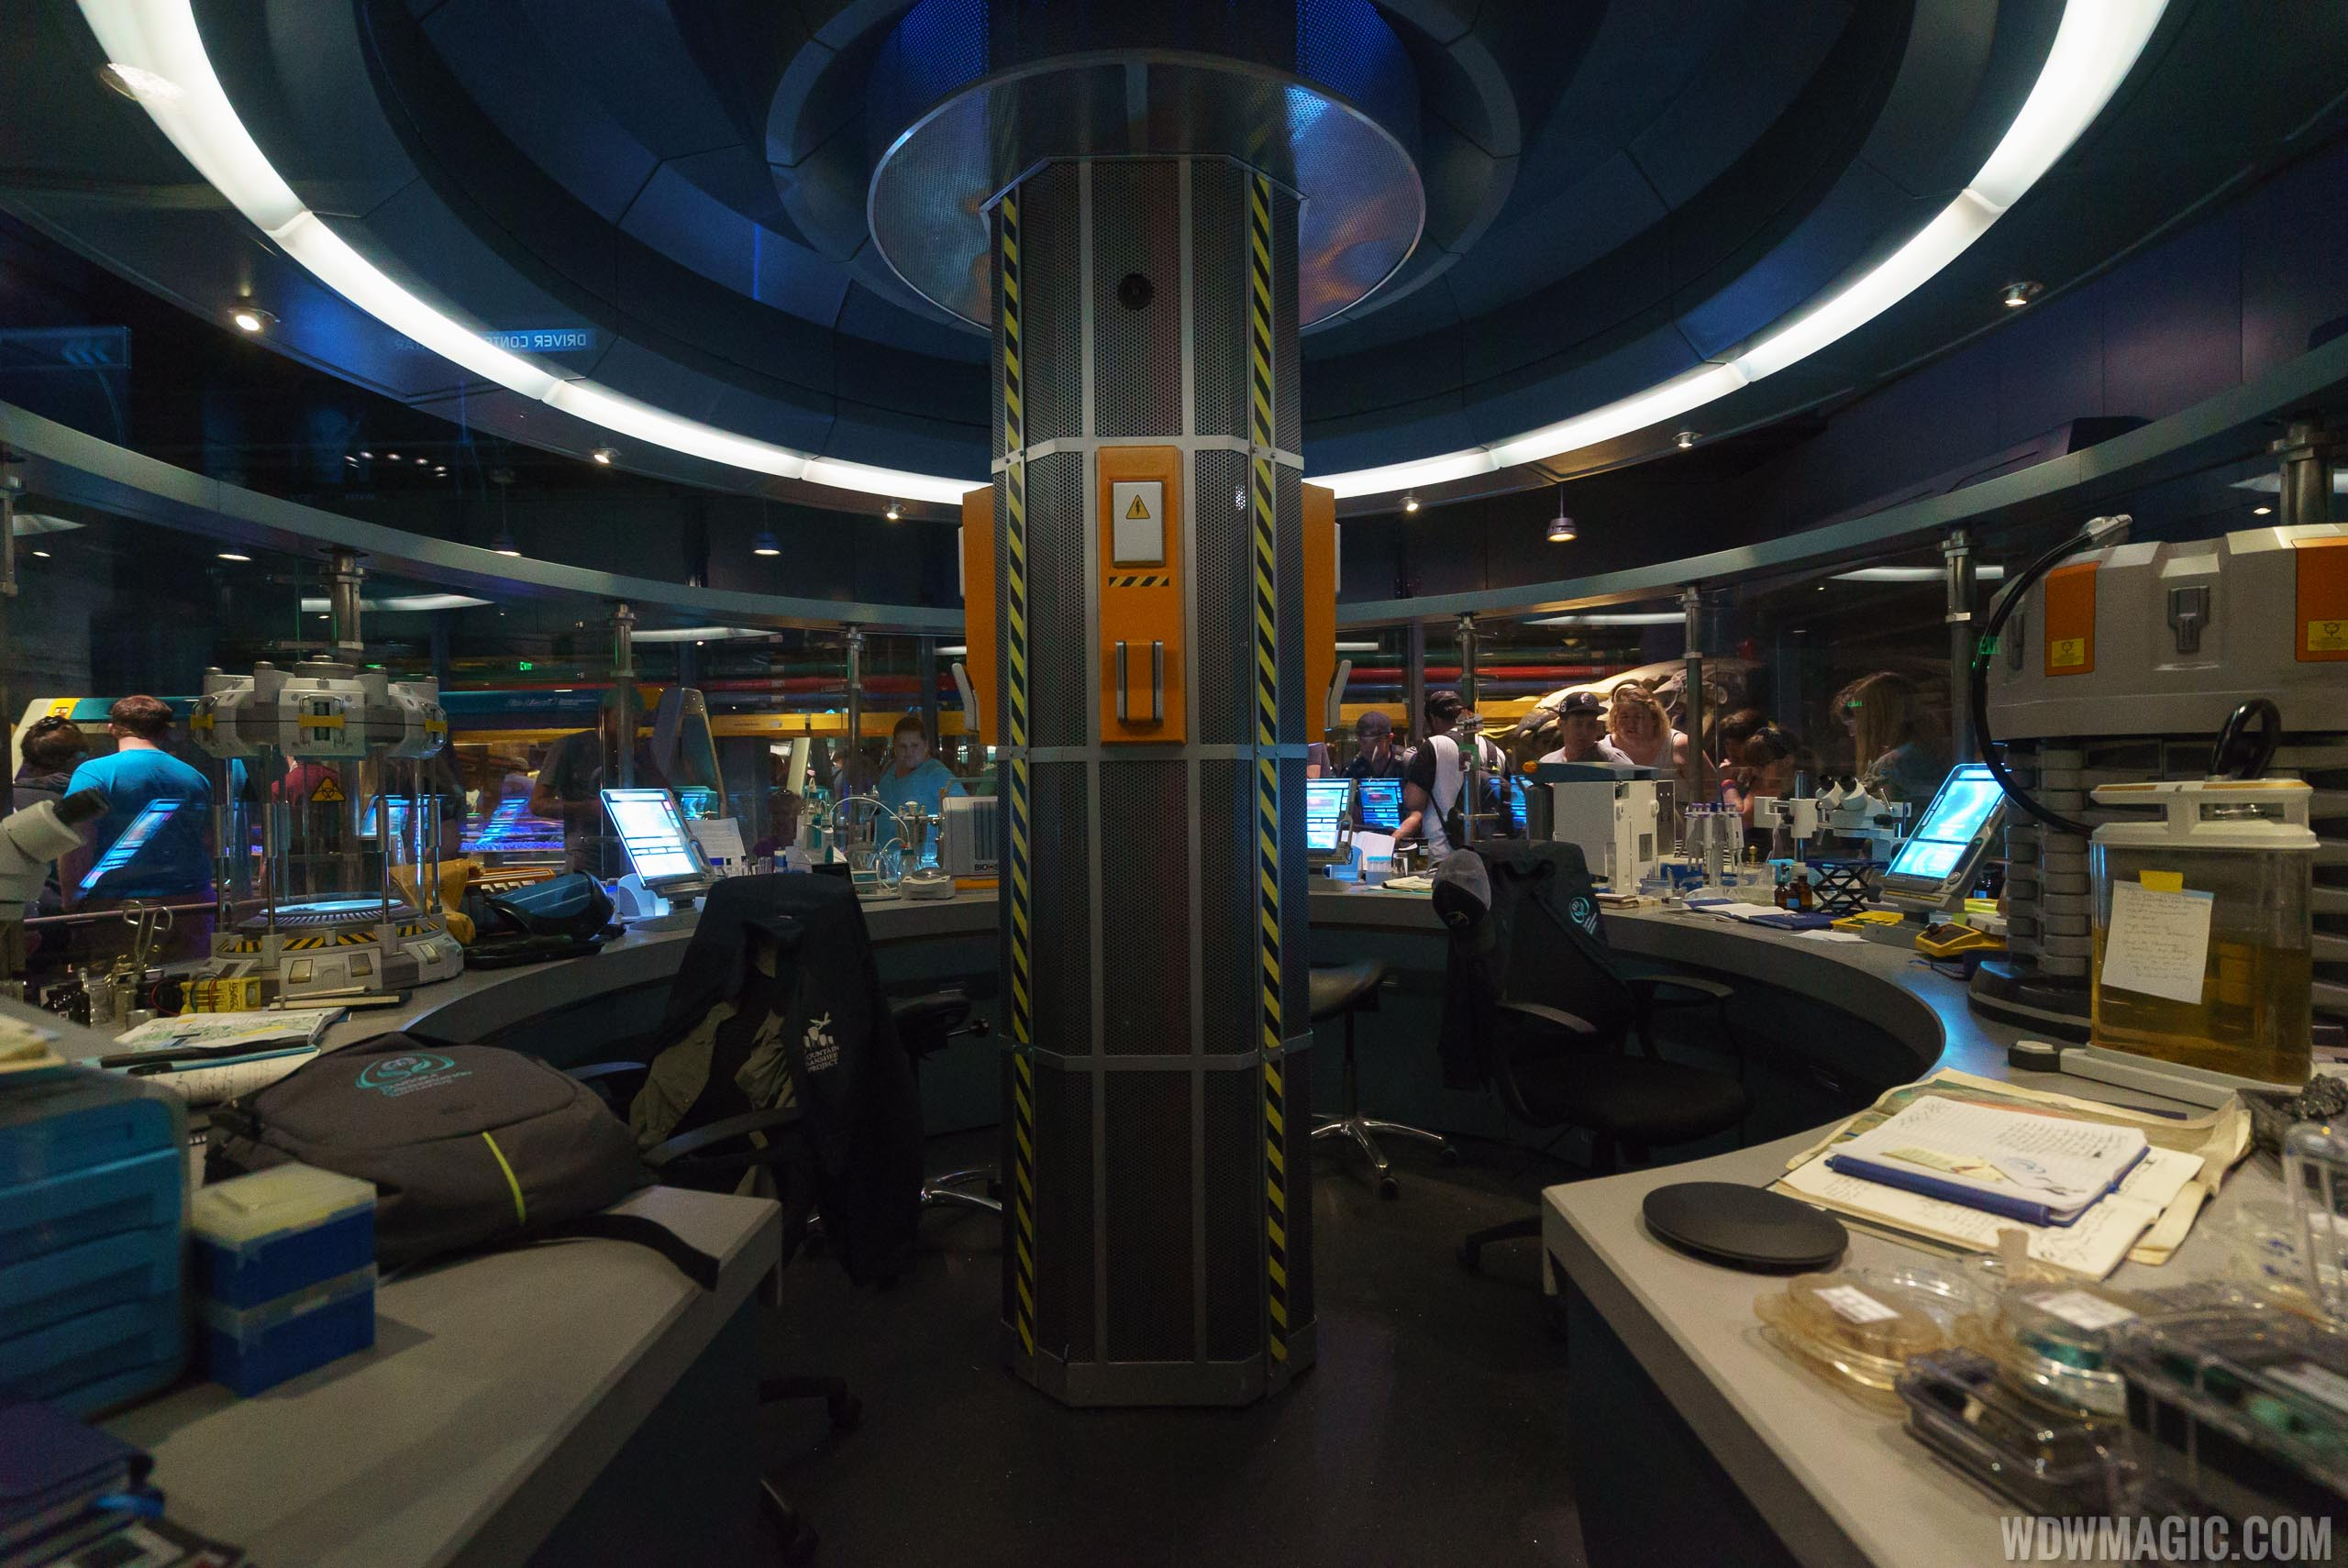 Avatar Flight of Passage queue - The PCI Lab